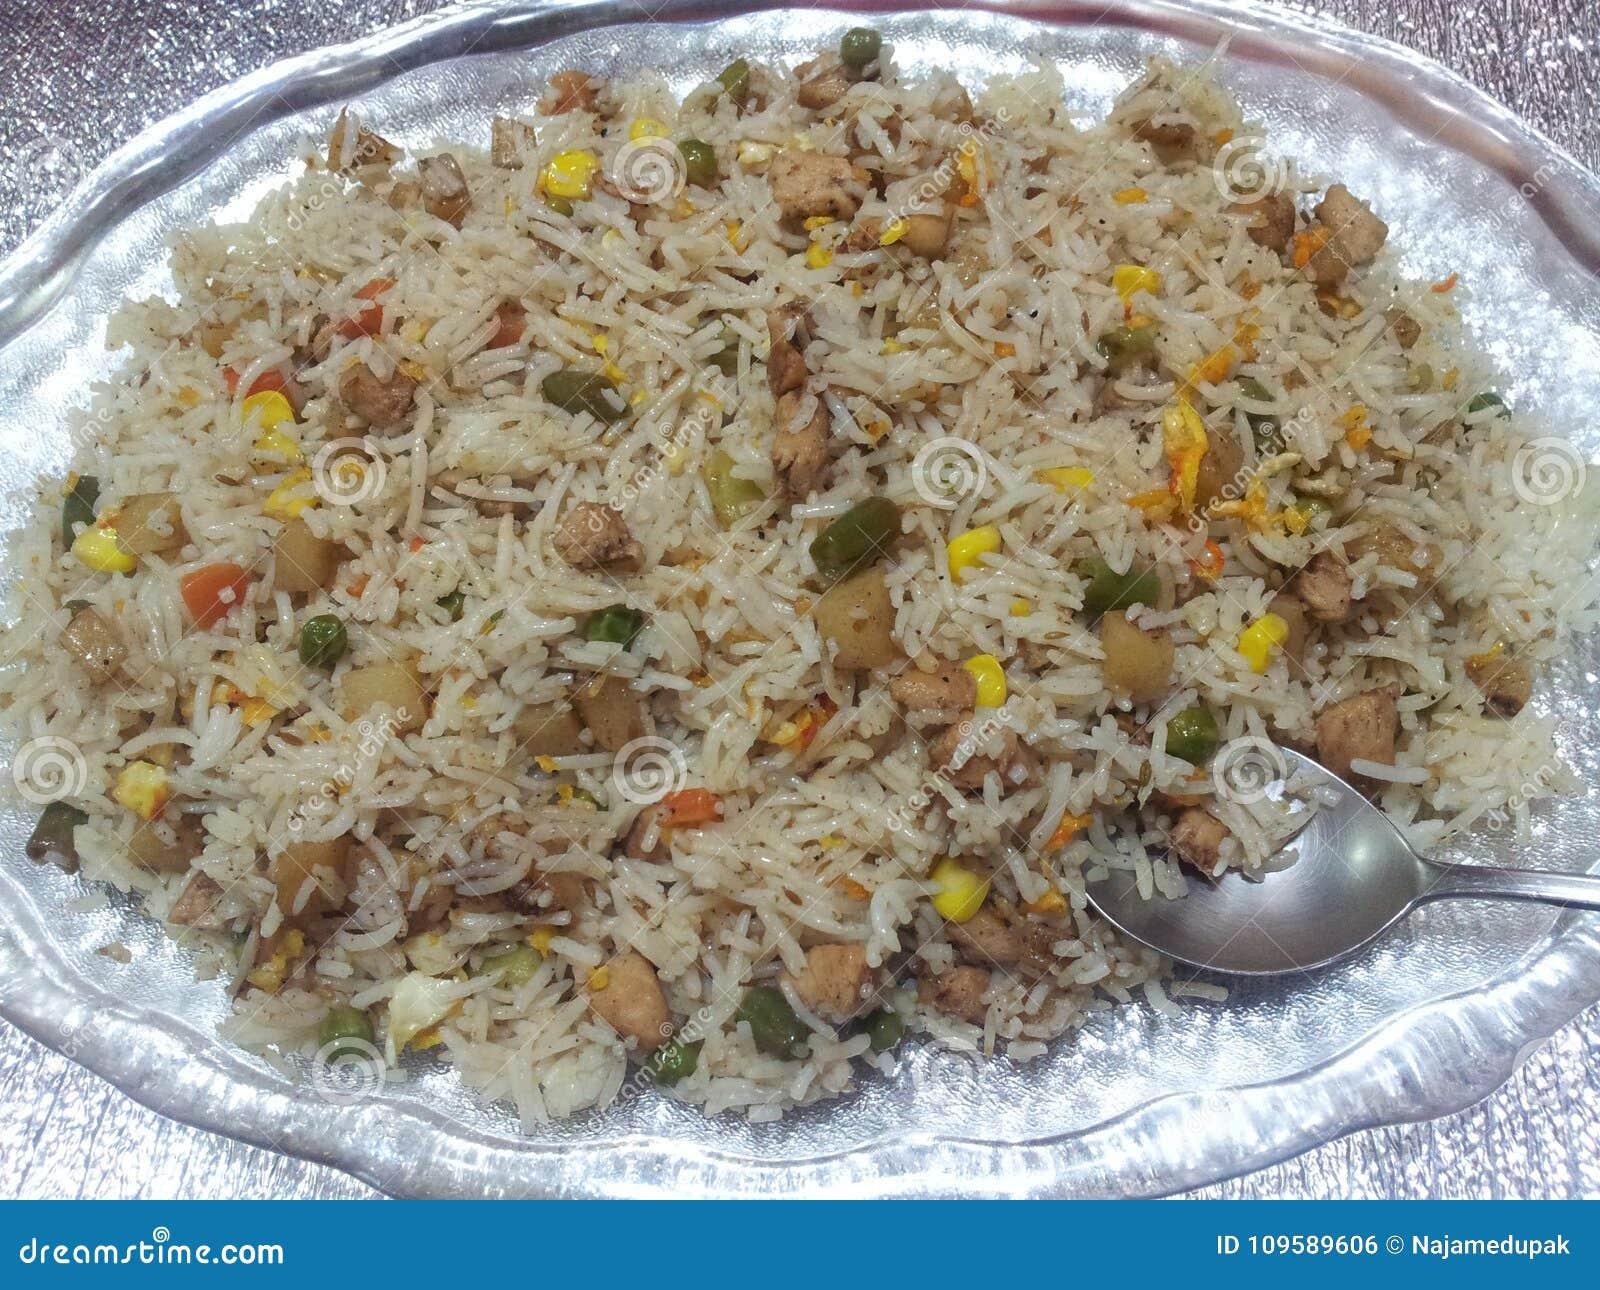 Basmati Rice Pulao or pulav with Peas